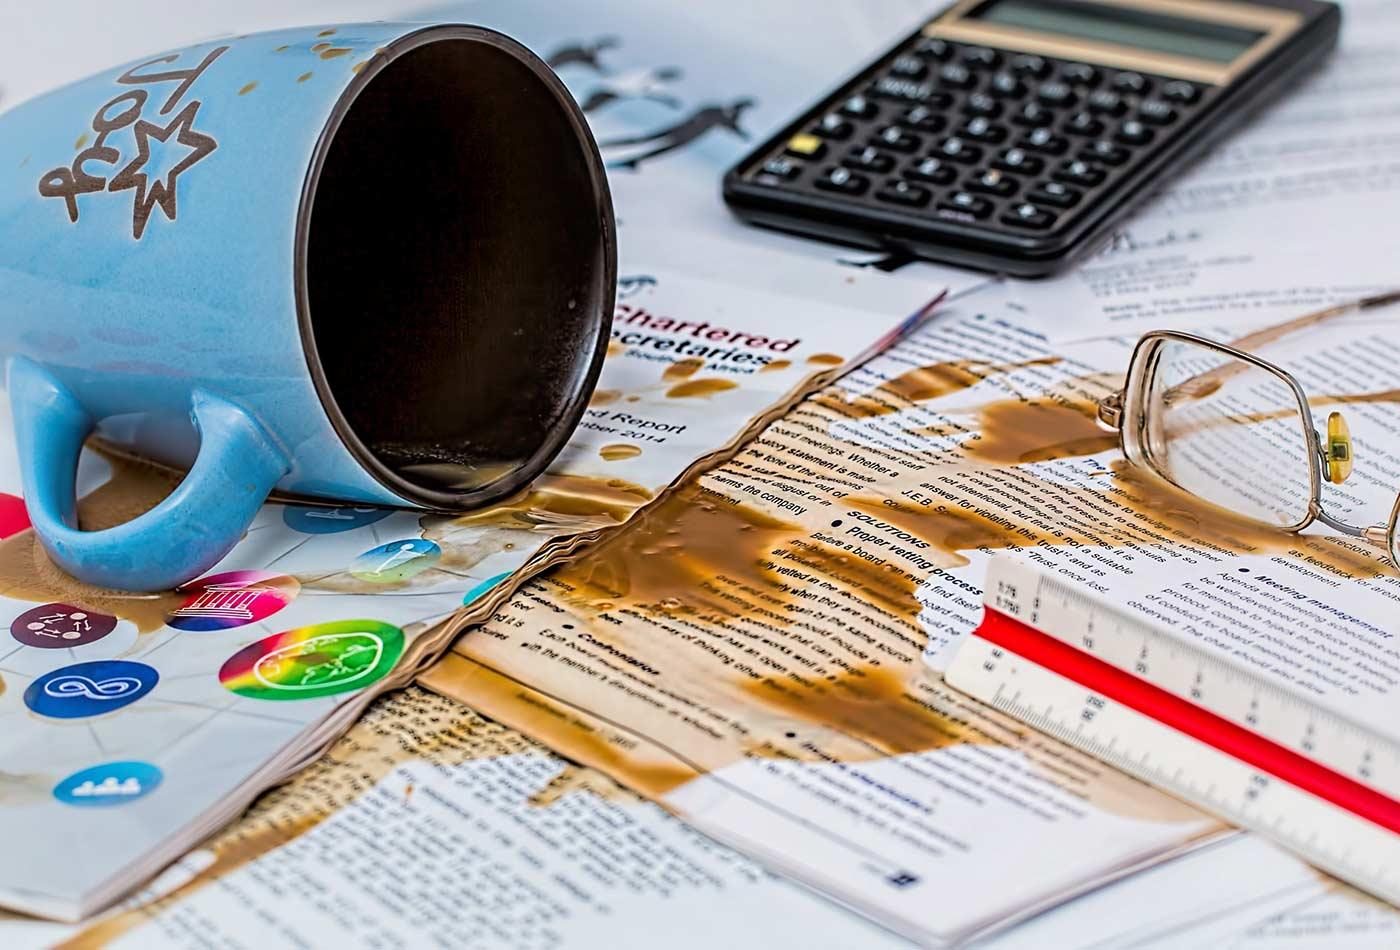 Coffee spill.